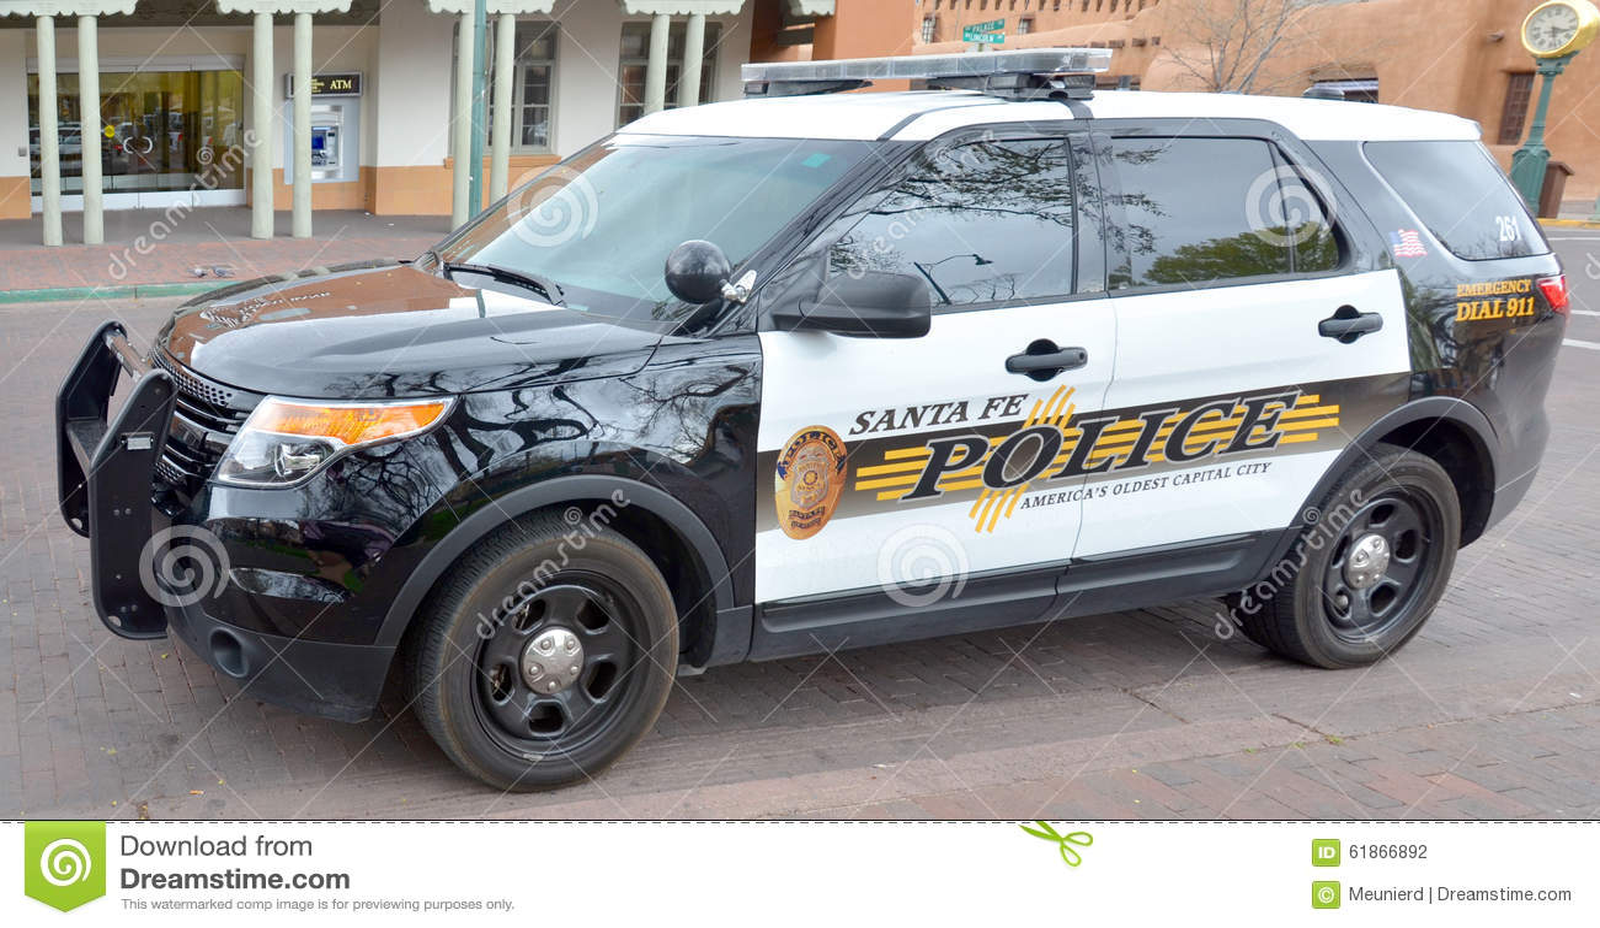 Santa fe police department car editorial photography for Motor vehicle division santa fe